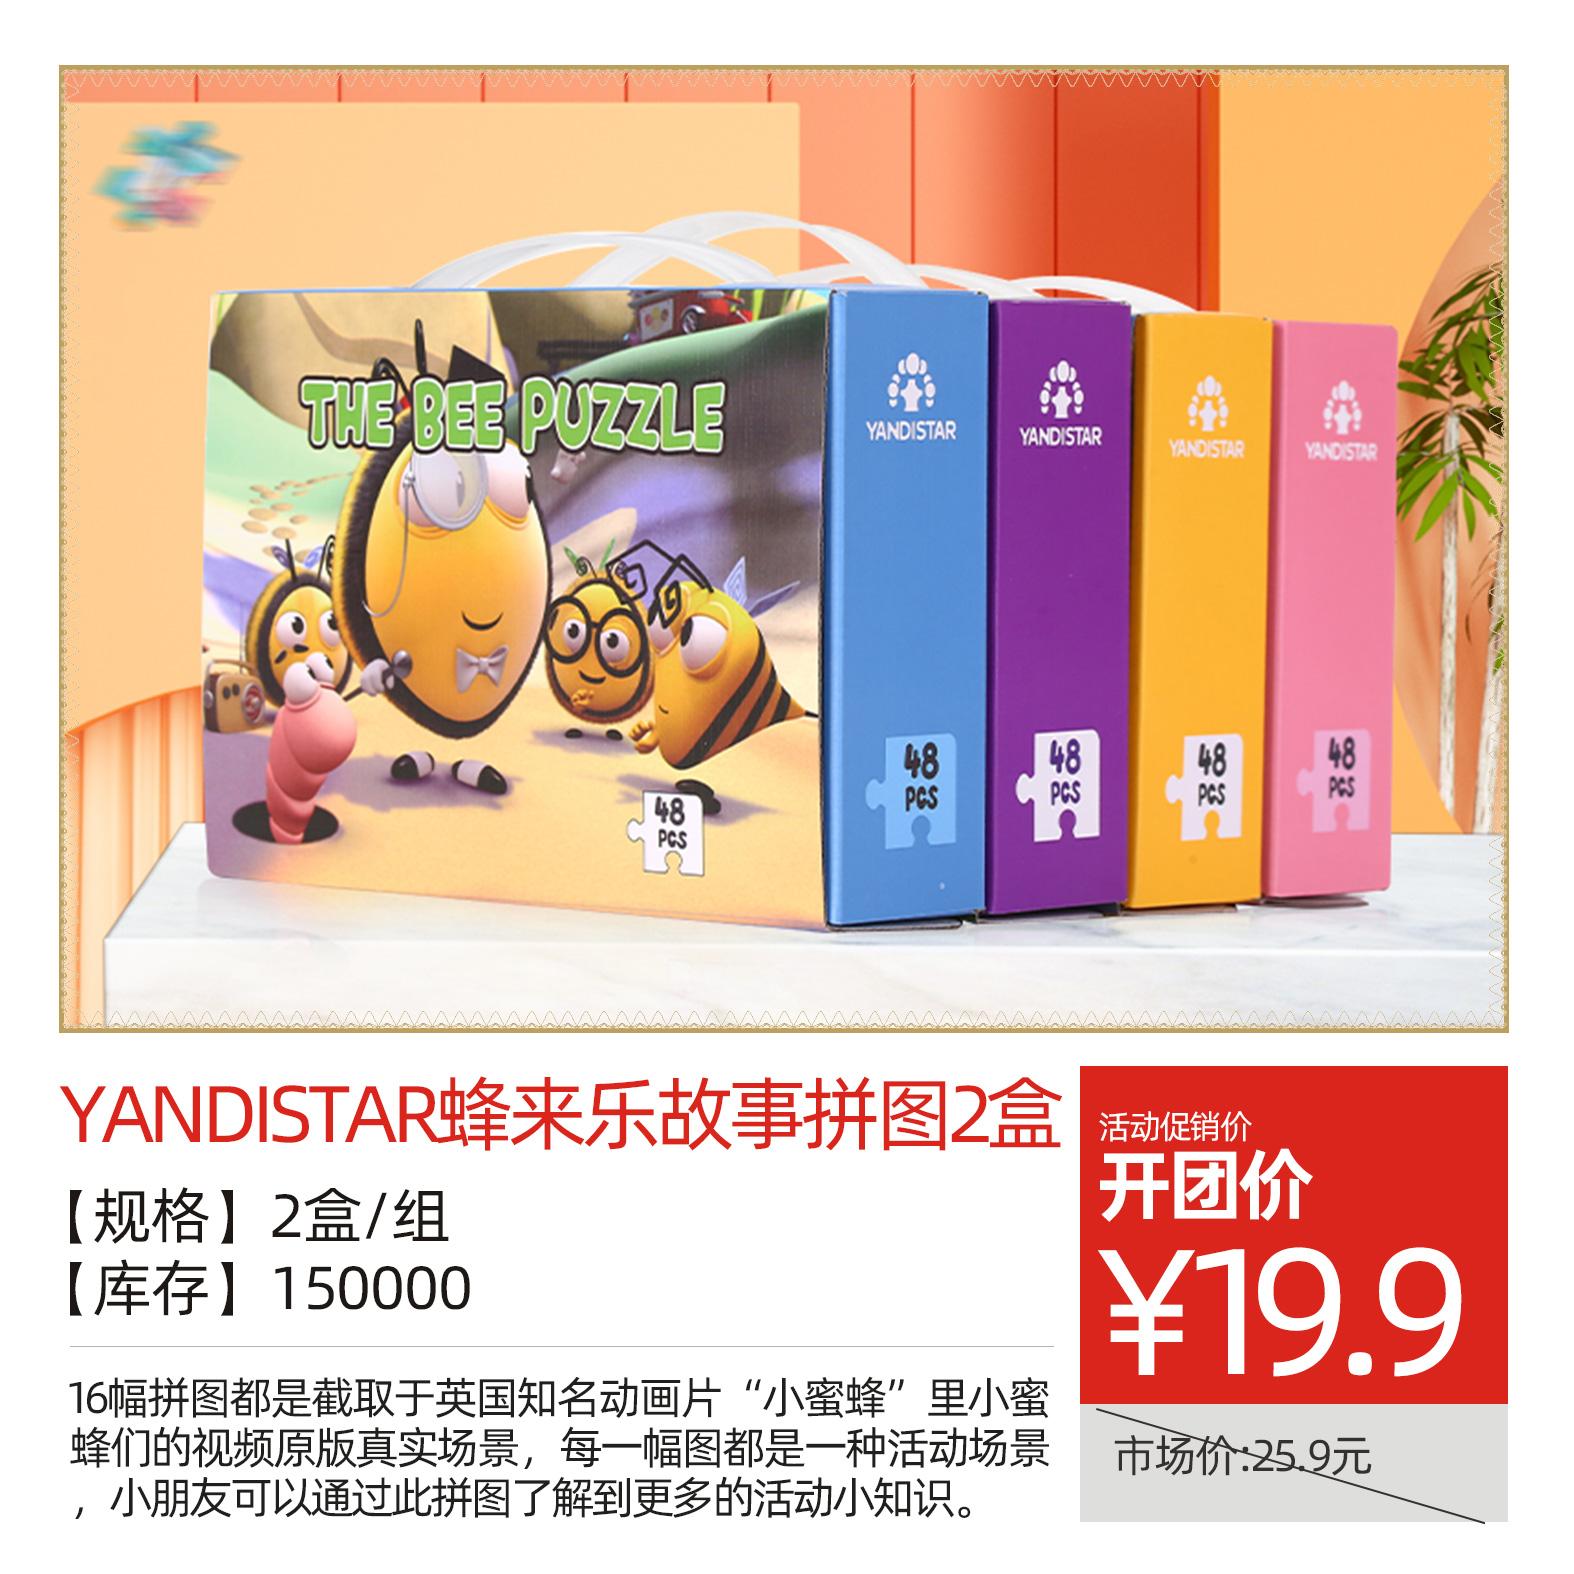 YANDISTAR蜂来乐故事拼图2盒